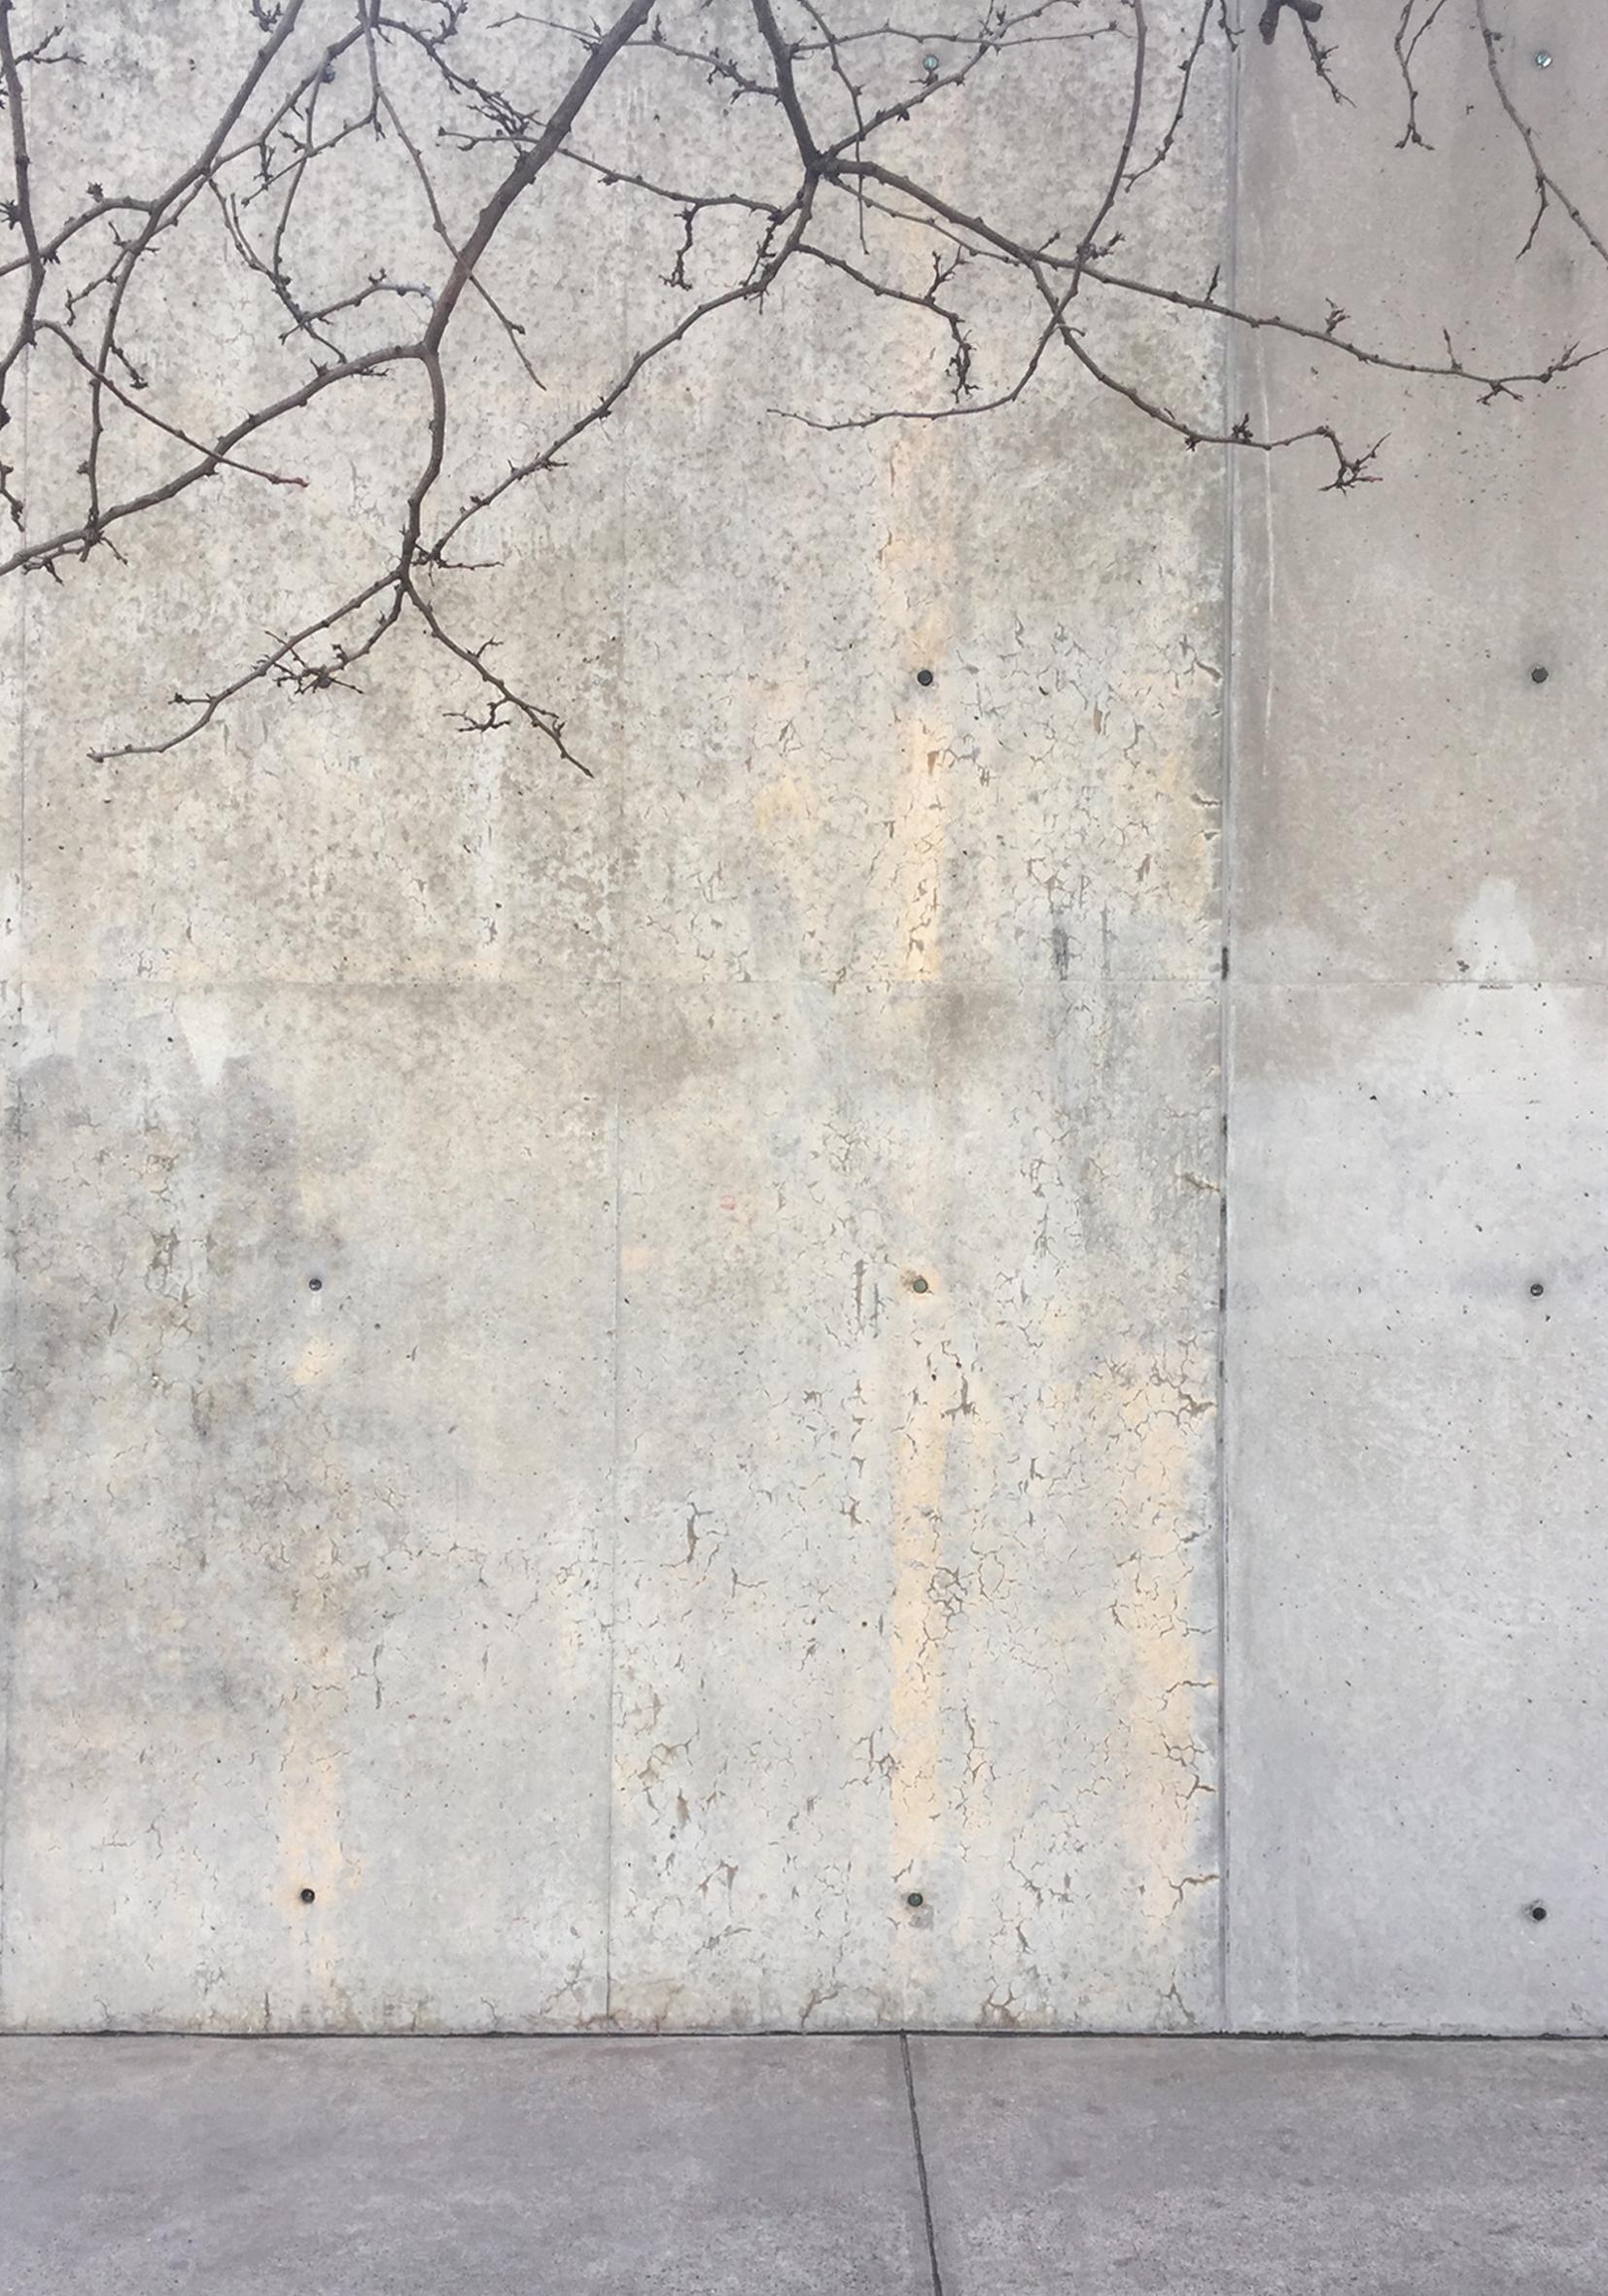 BAURAIN FW17 concrete NYC